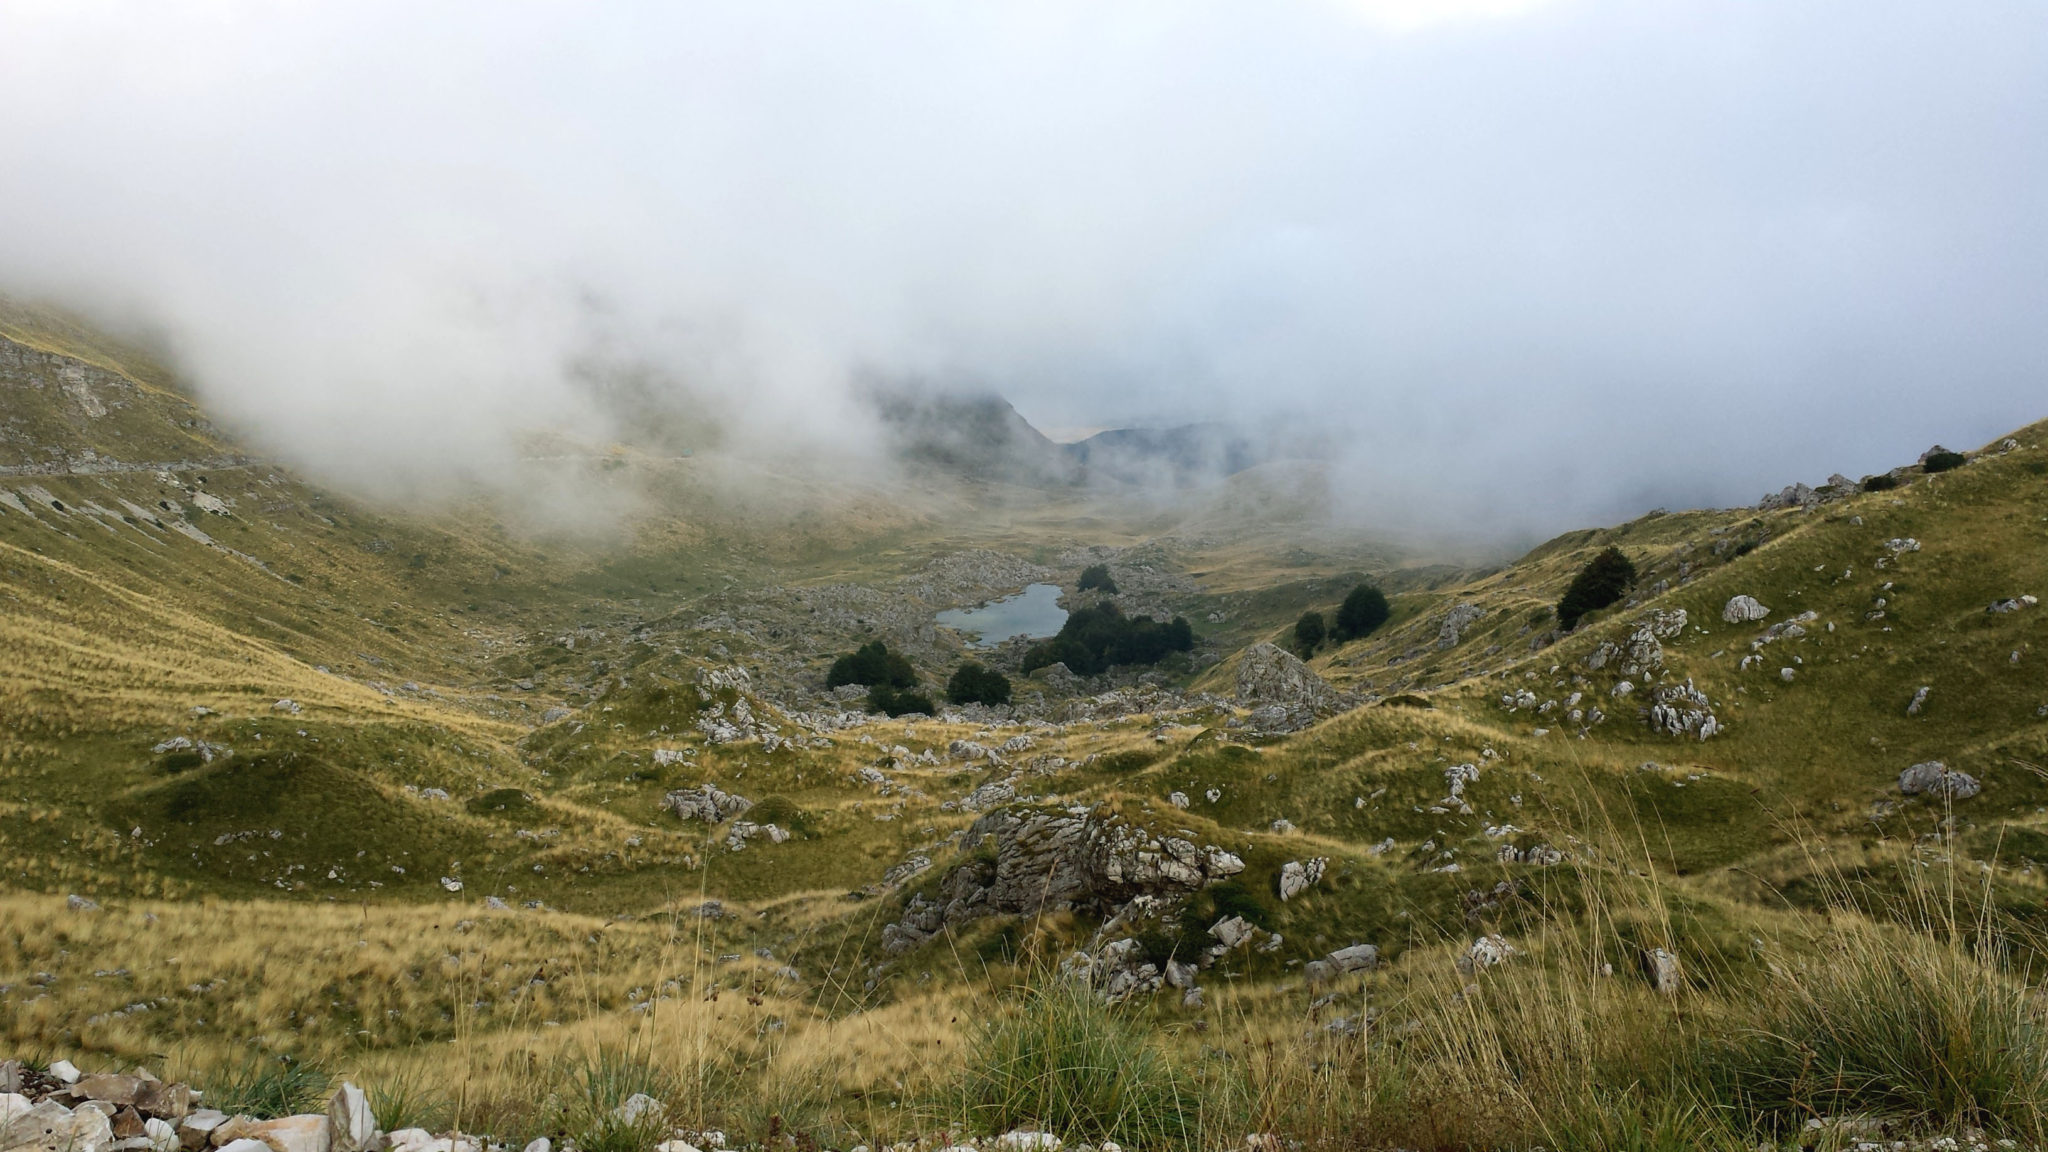 Hemaposesesvalises_vers_le_parc_de_durmitor_trsa_travel_voyage_blog15